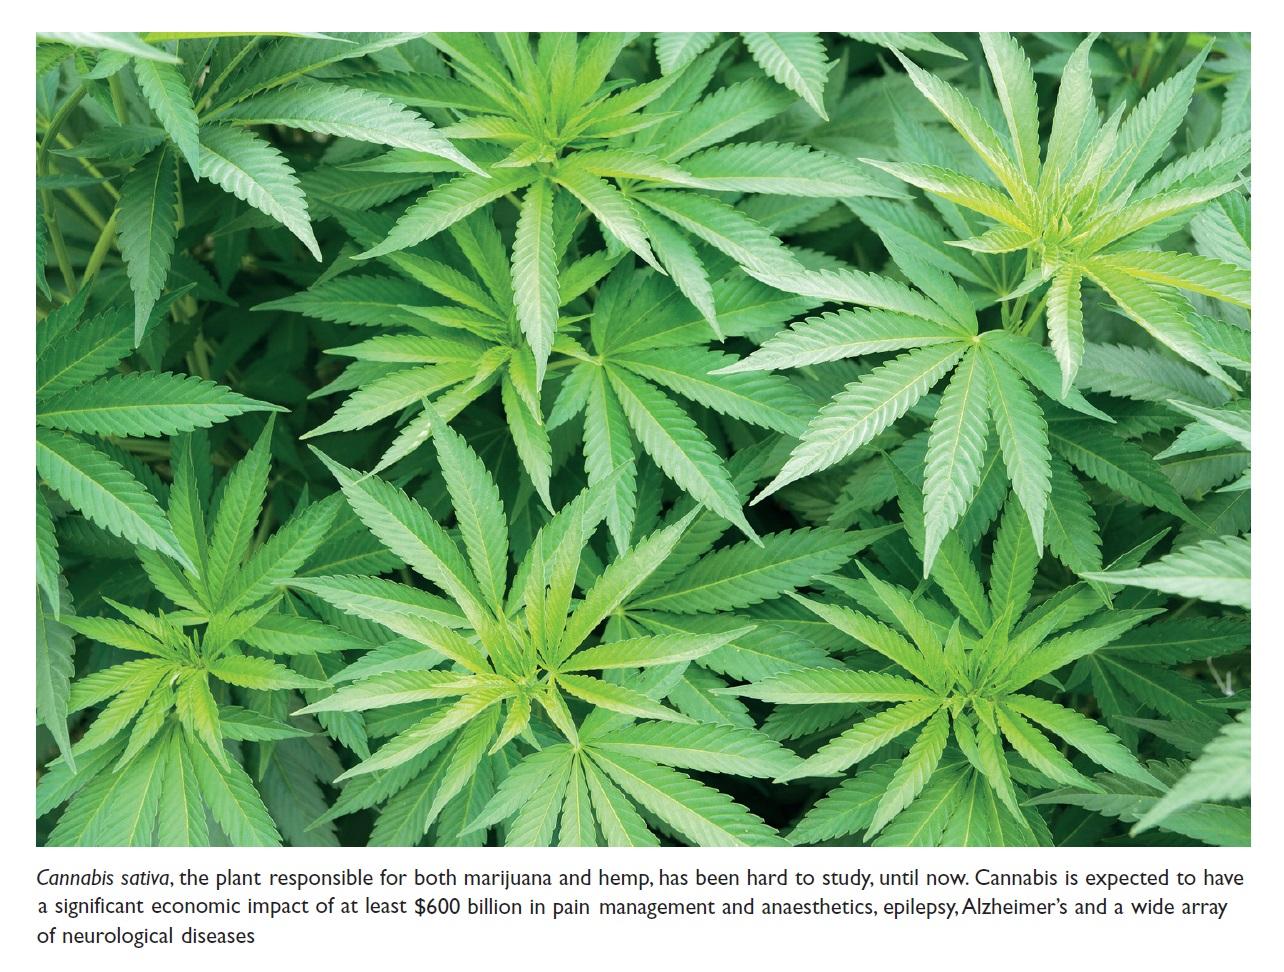 Figure 1 Cannabis sativa, the plant responsible for both marijuana and hemp